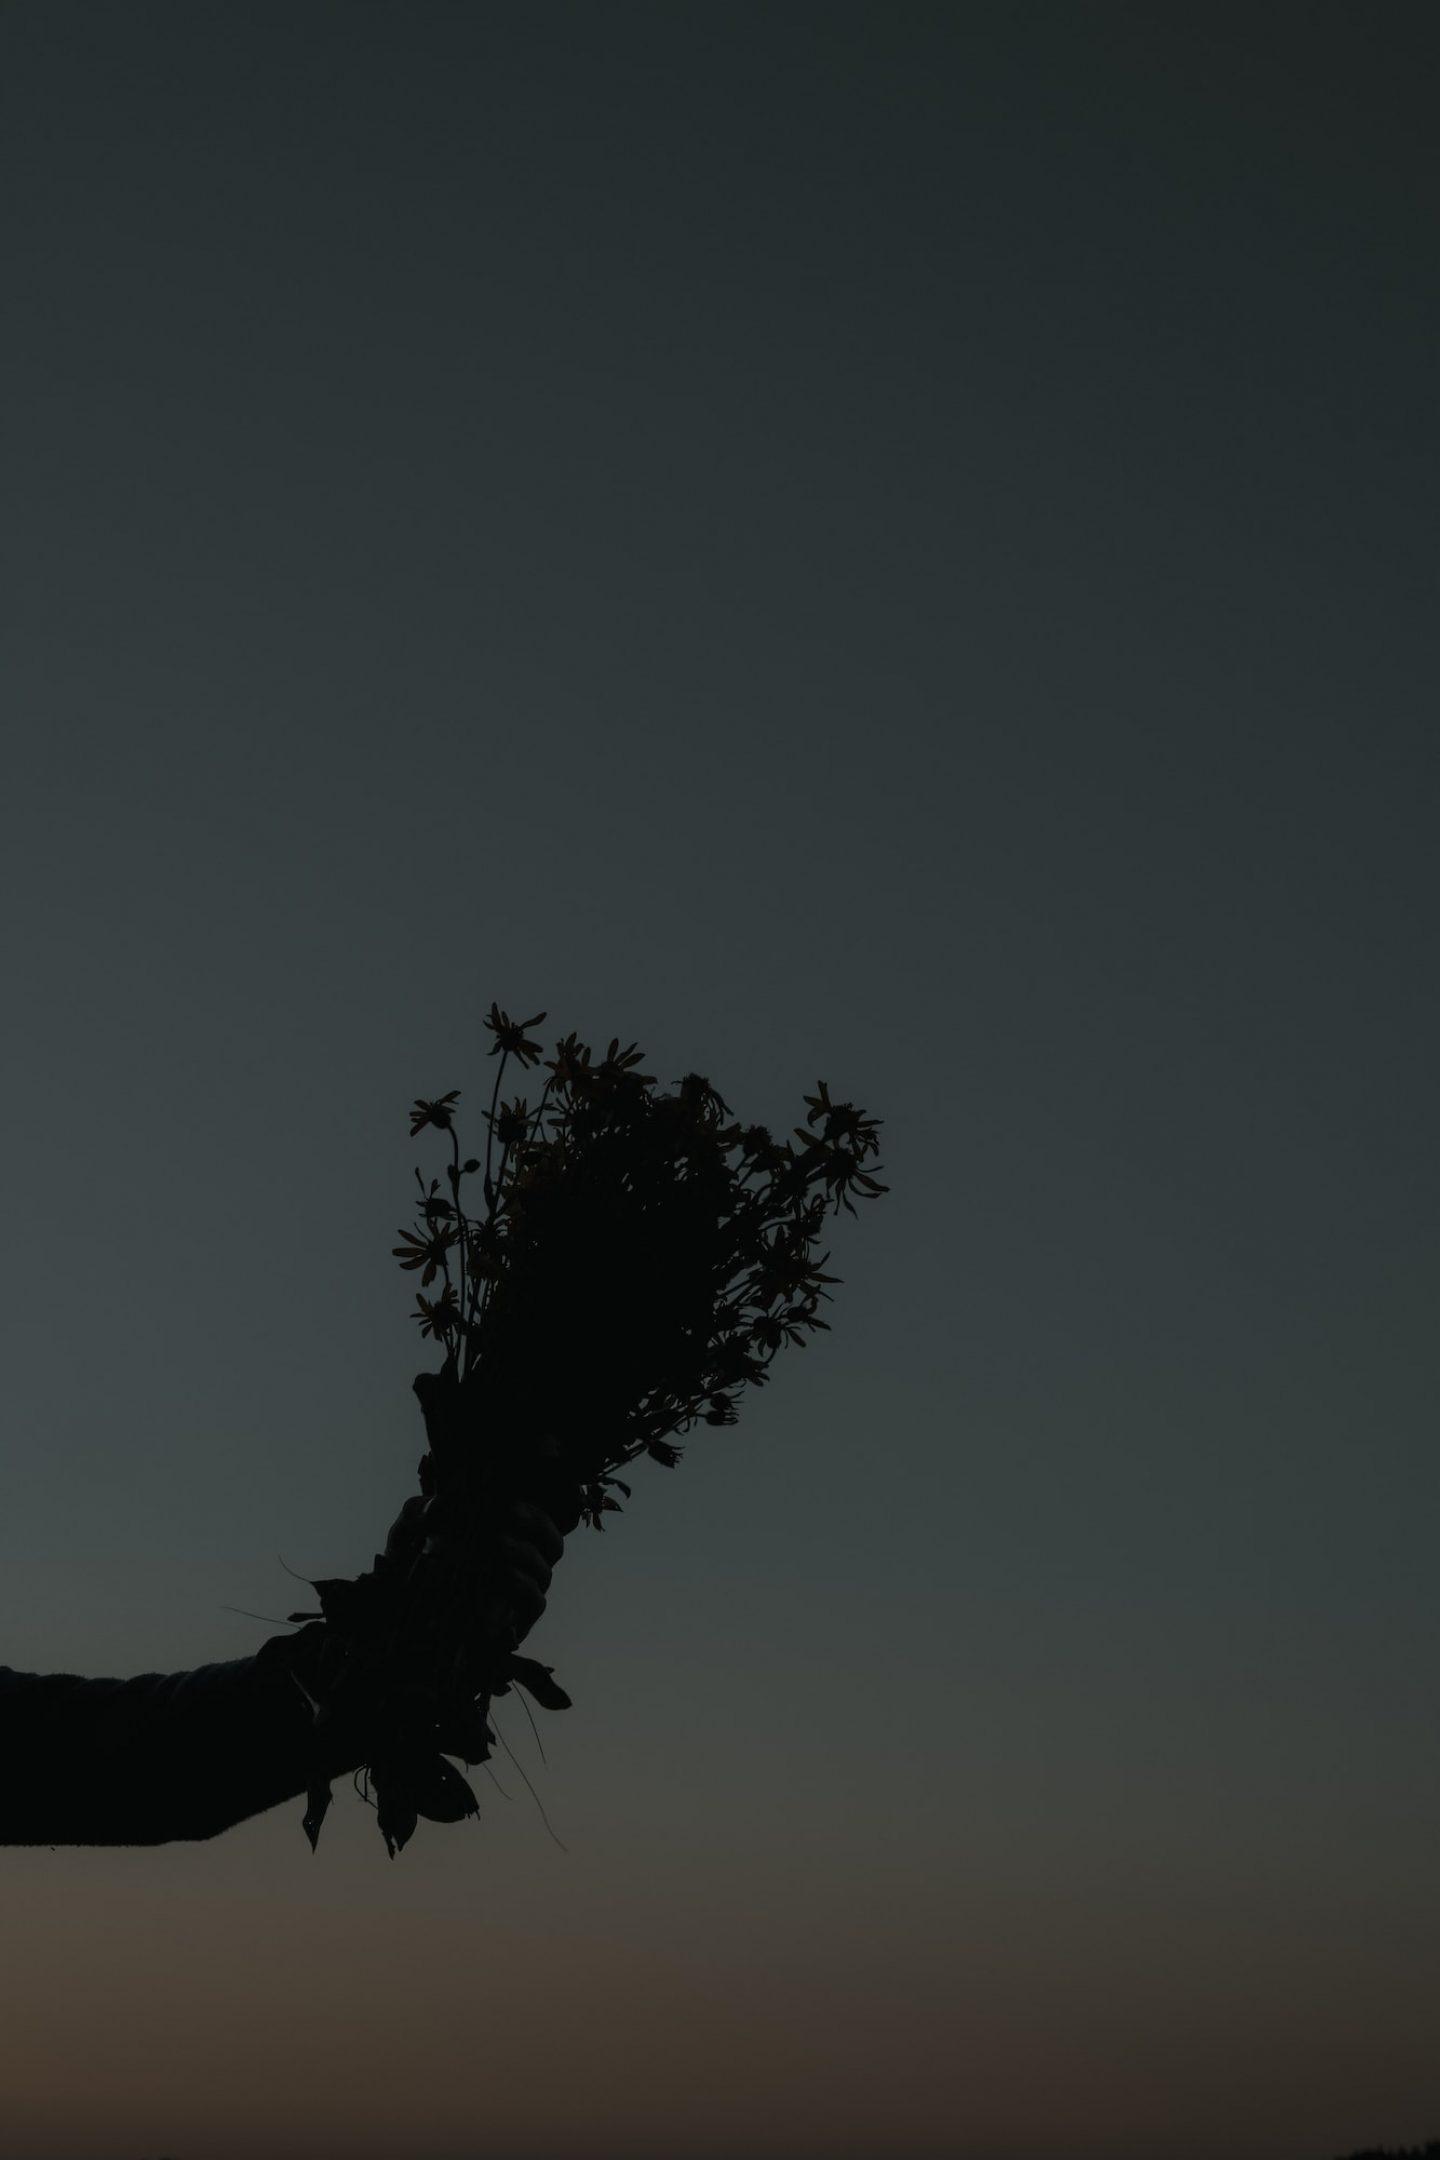 IGNANT-Dr-Hauschka-Wild-Plant-Harvest-Clemens-Poloczek-011